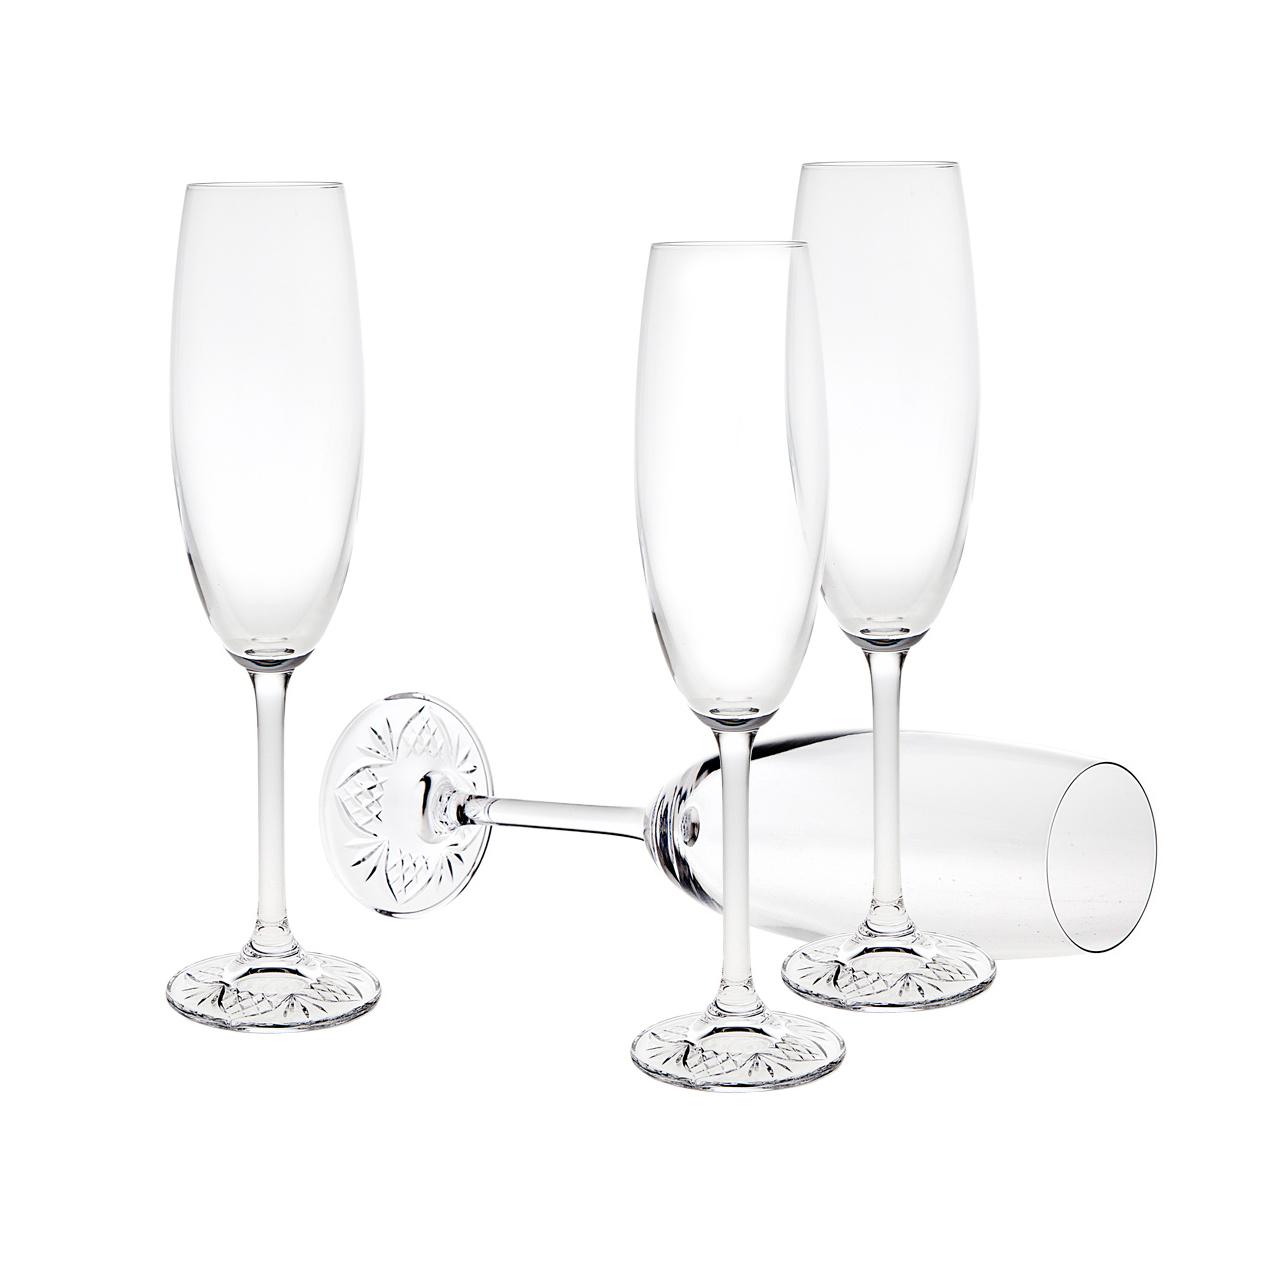 1280x1280 A Taste Of Dublin Set Of 4 Champagne Flutes Bowring